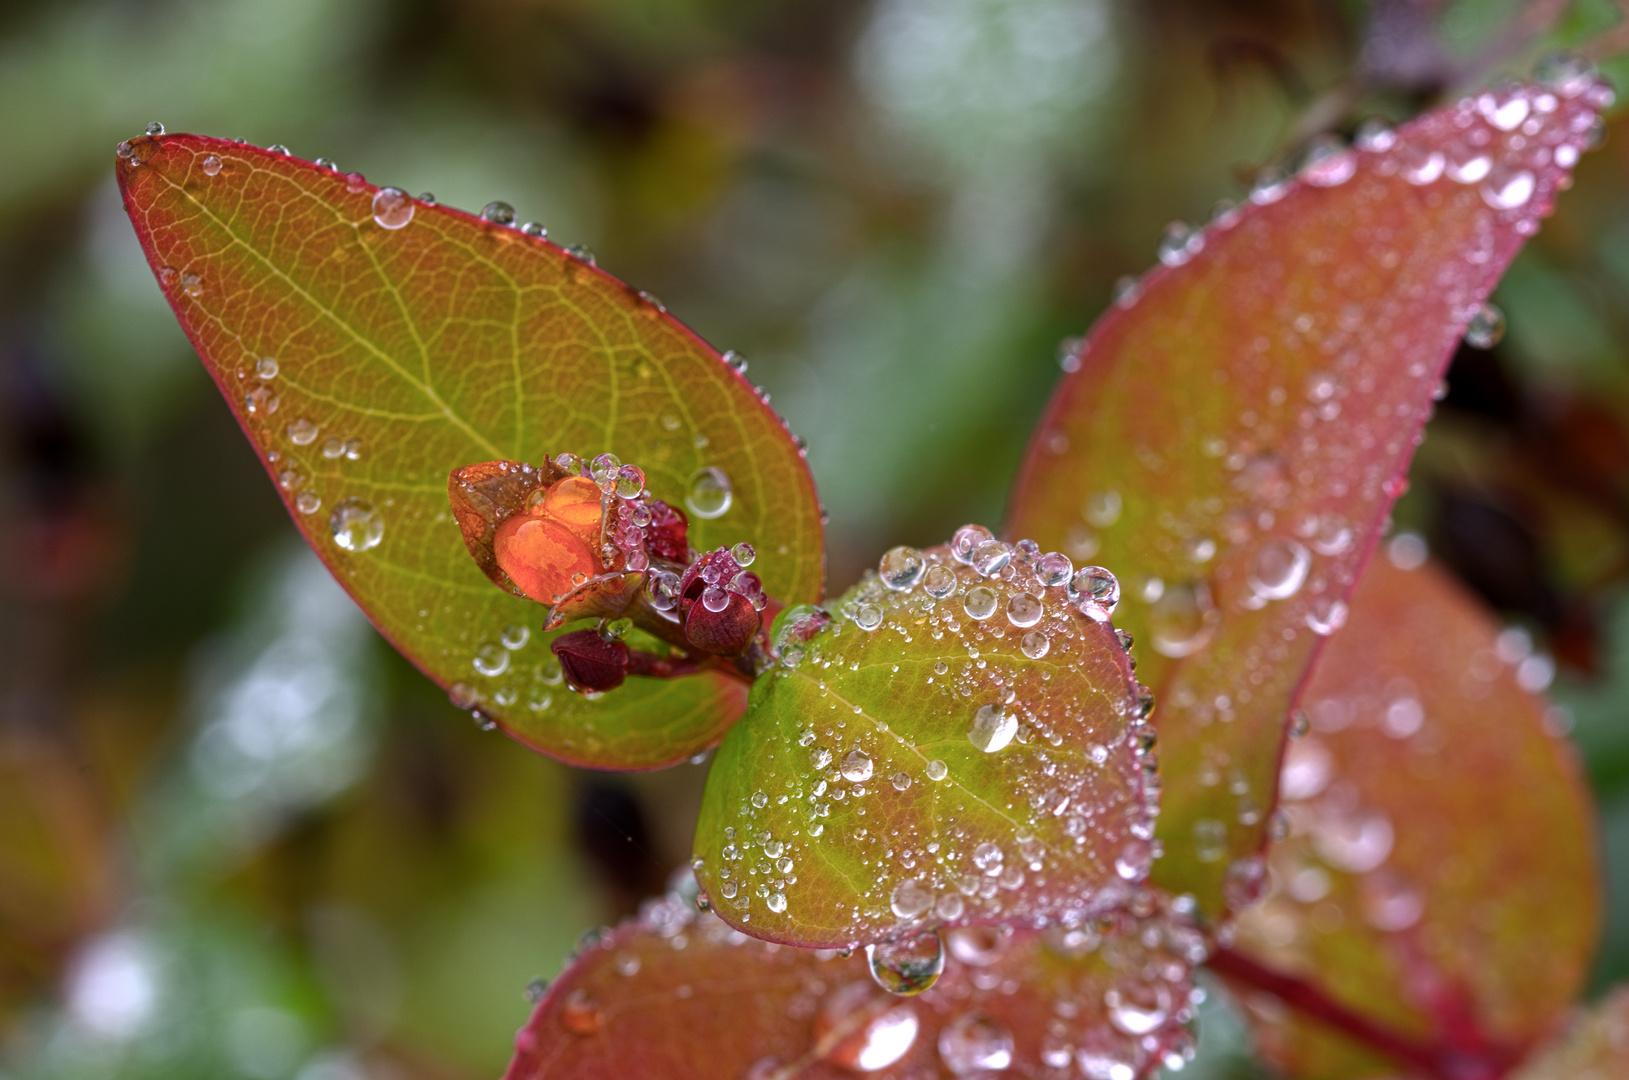 Herbst im Garten - Johanniskraut